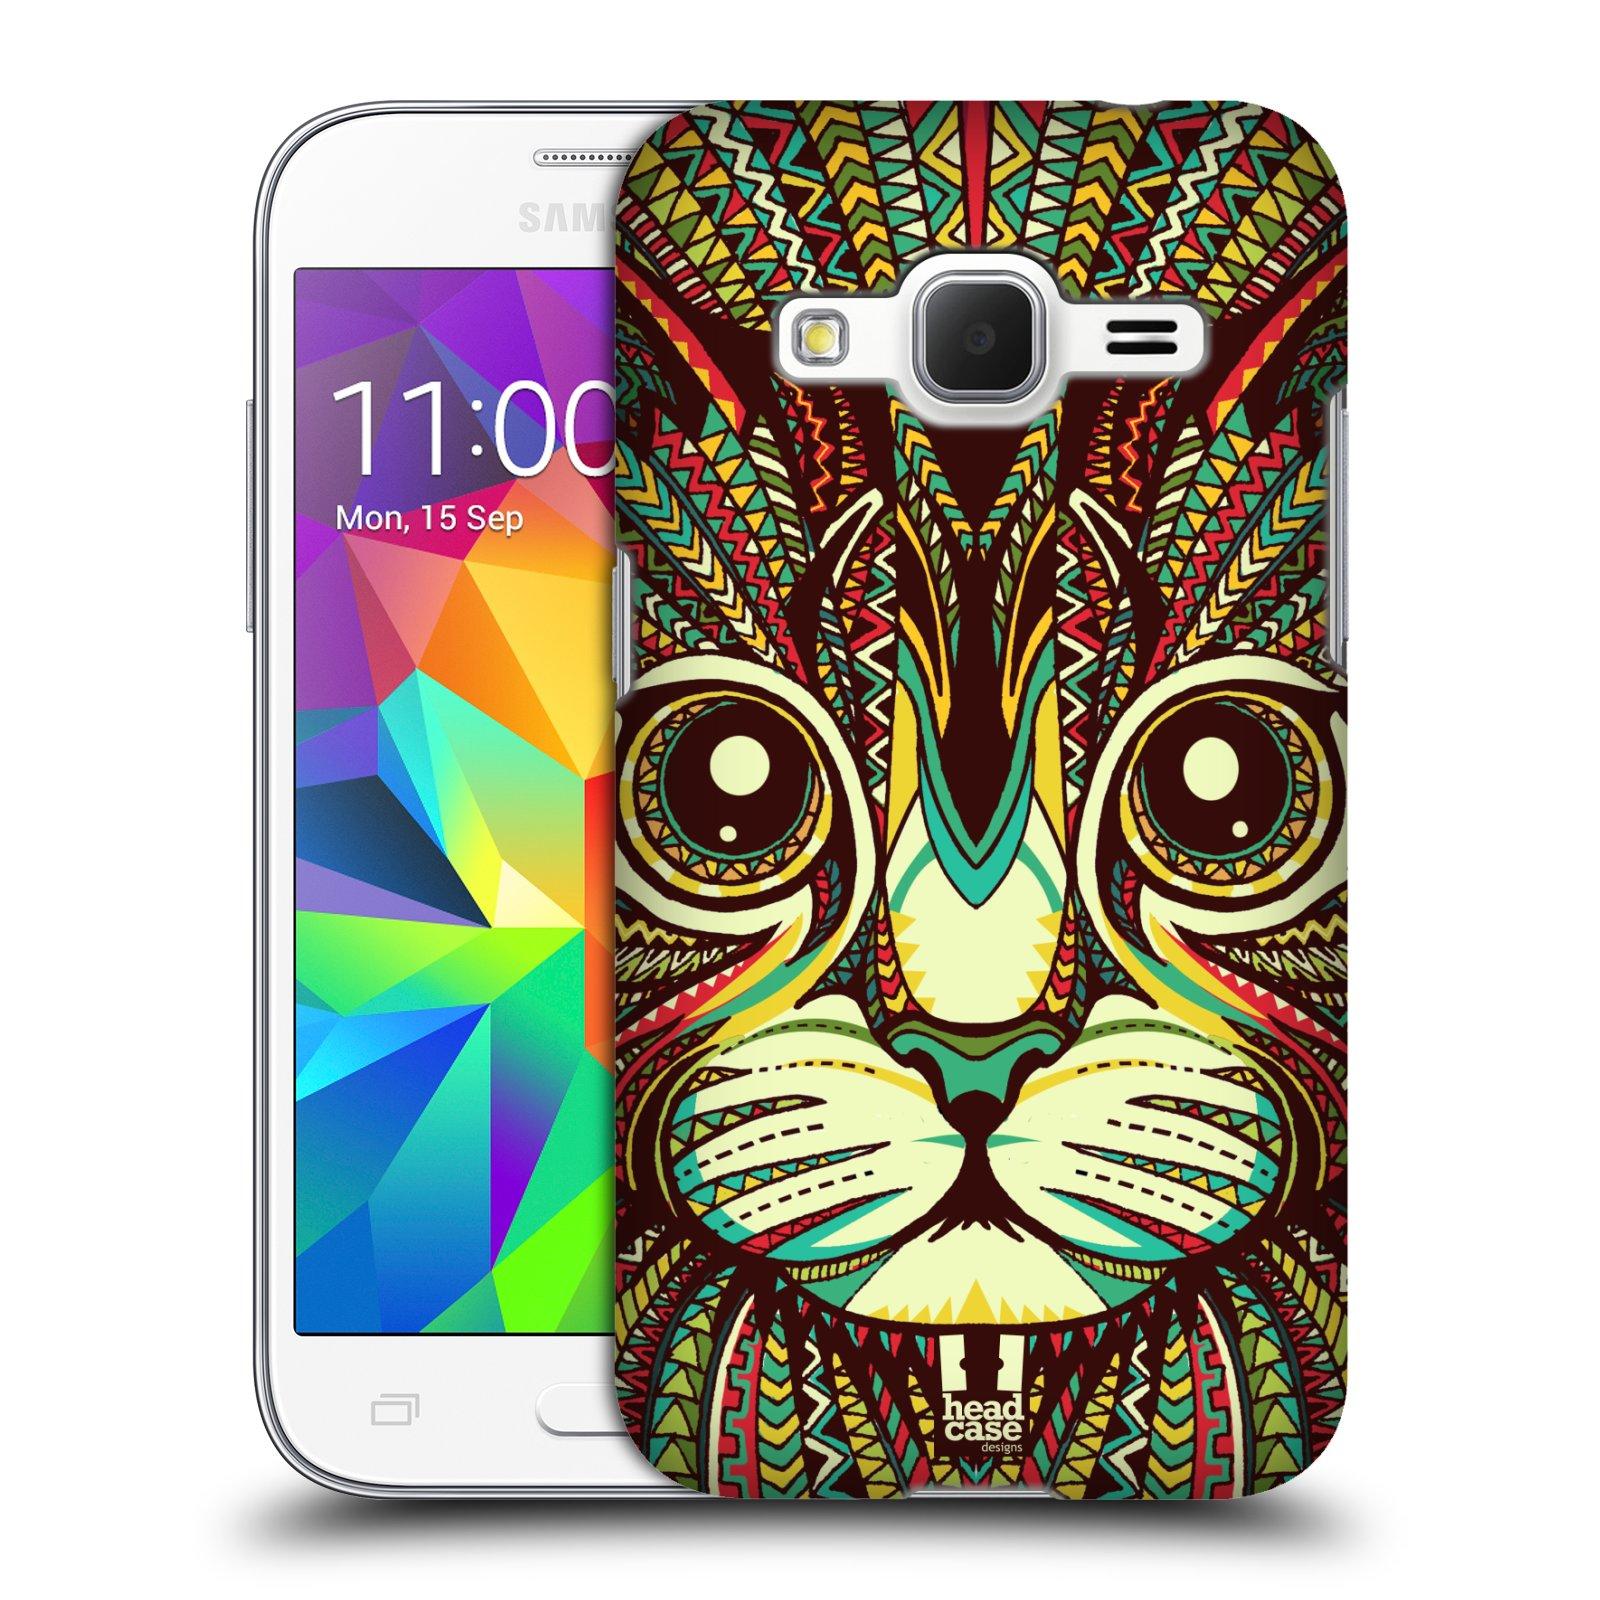 Plastové pouzdro na mobil Samsung Galaxy Core Prime VE HEAD CASE AZTEC KOČKA (Kryt či obal na mobilní telefon Samsung Galaxy Core Prime LTE VE SM-G361F)